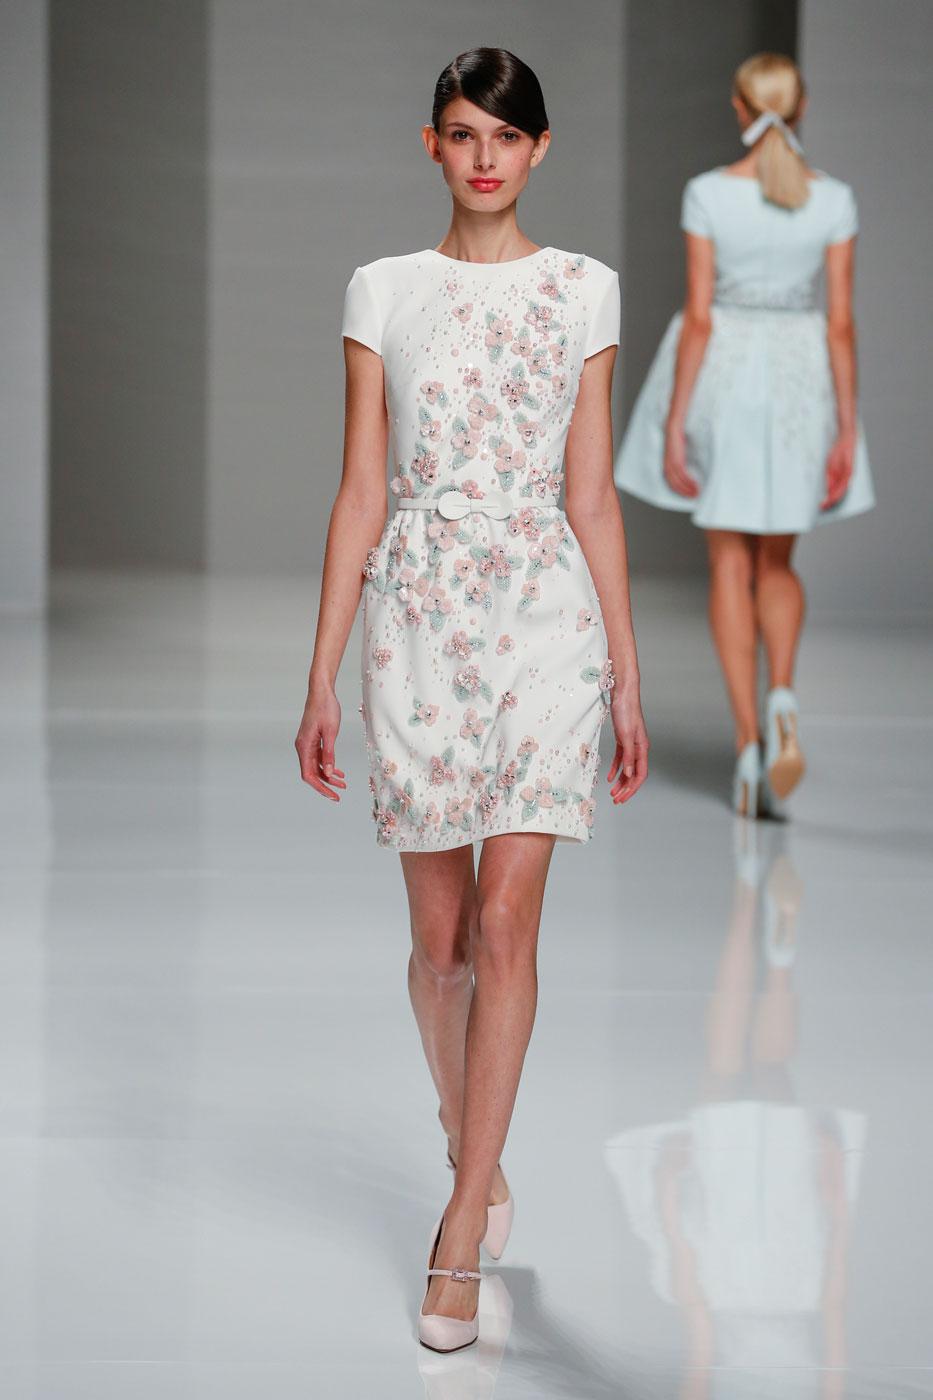 Georges-Hobeika-fashion-runway-show-haute-couture-paris-spring-2015-the-impression-05